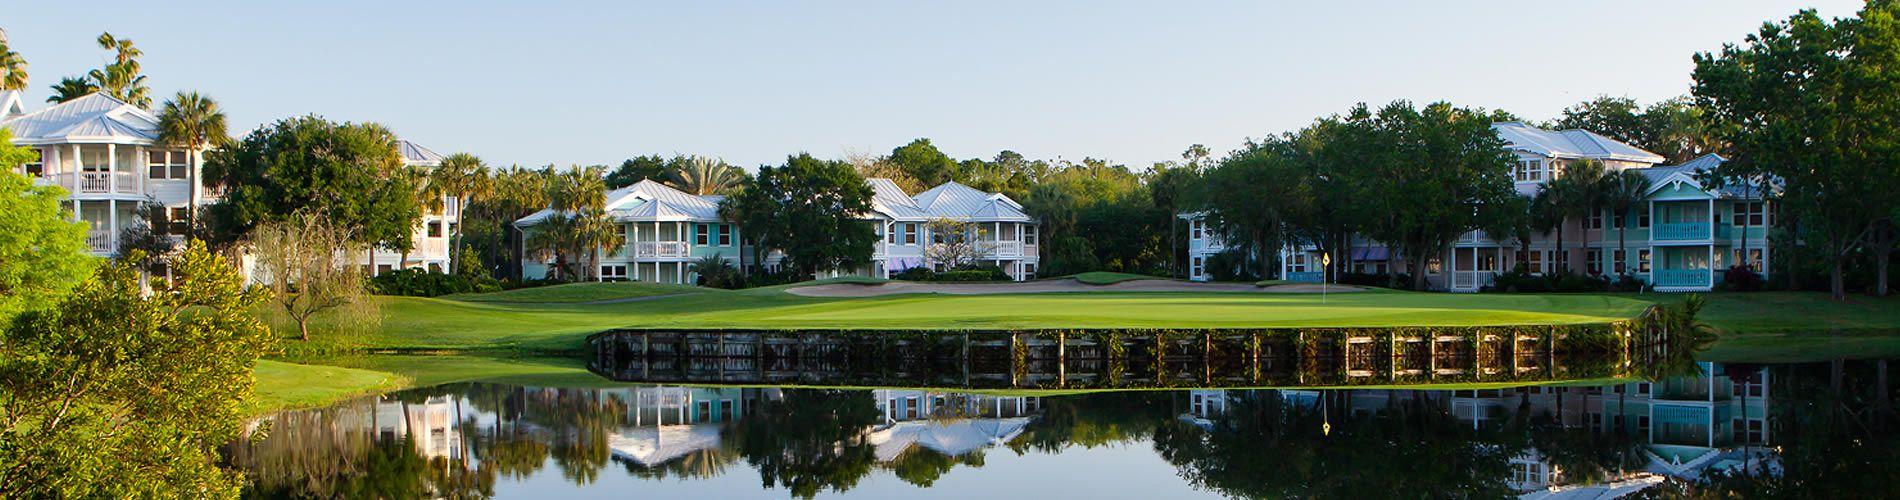 36+ Buena vista golf orlando info